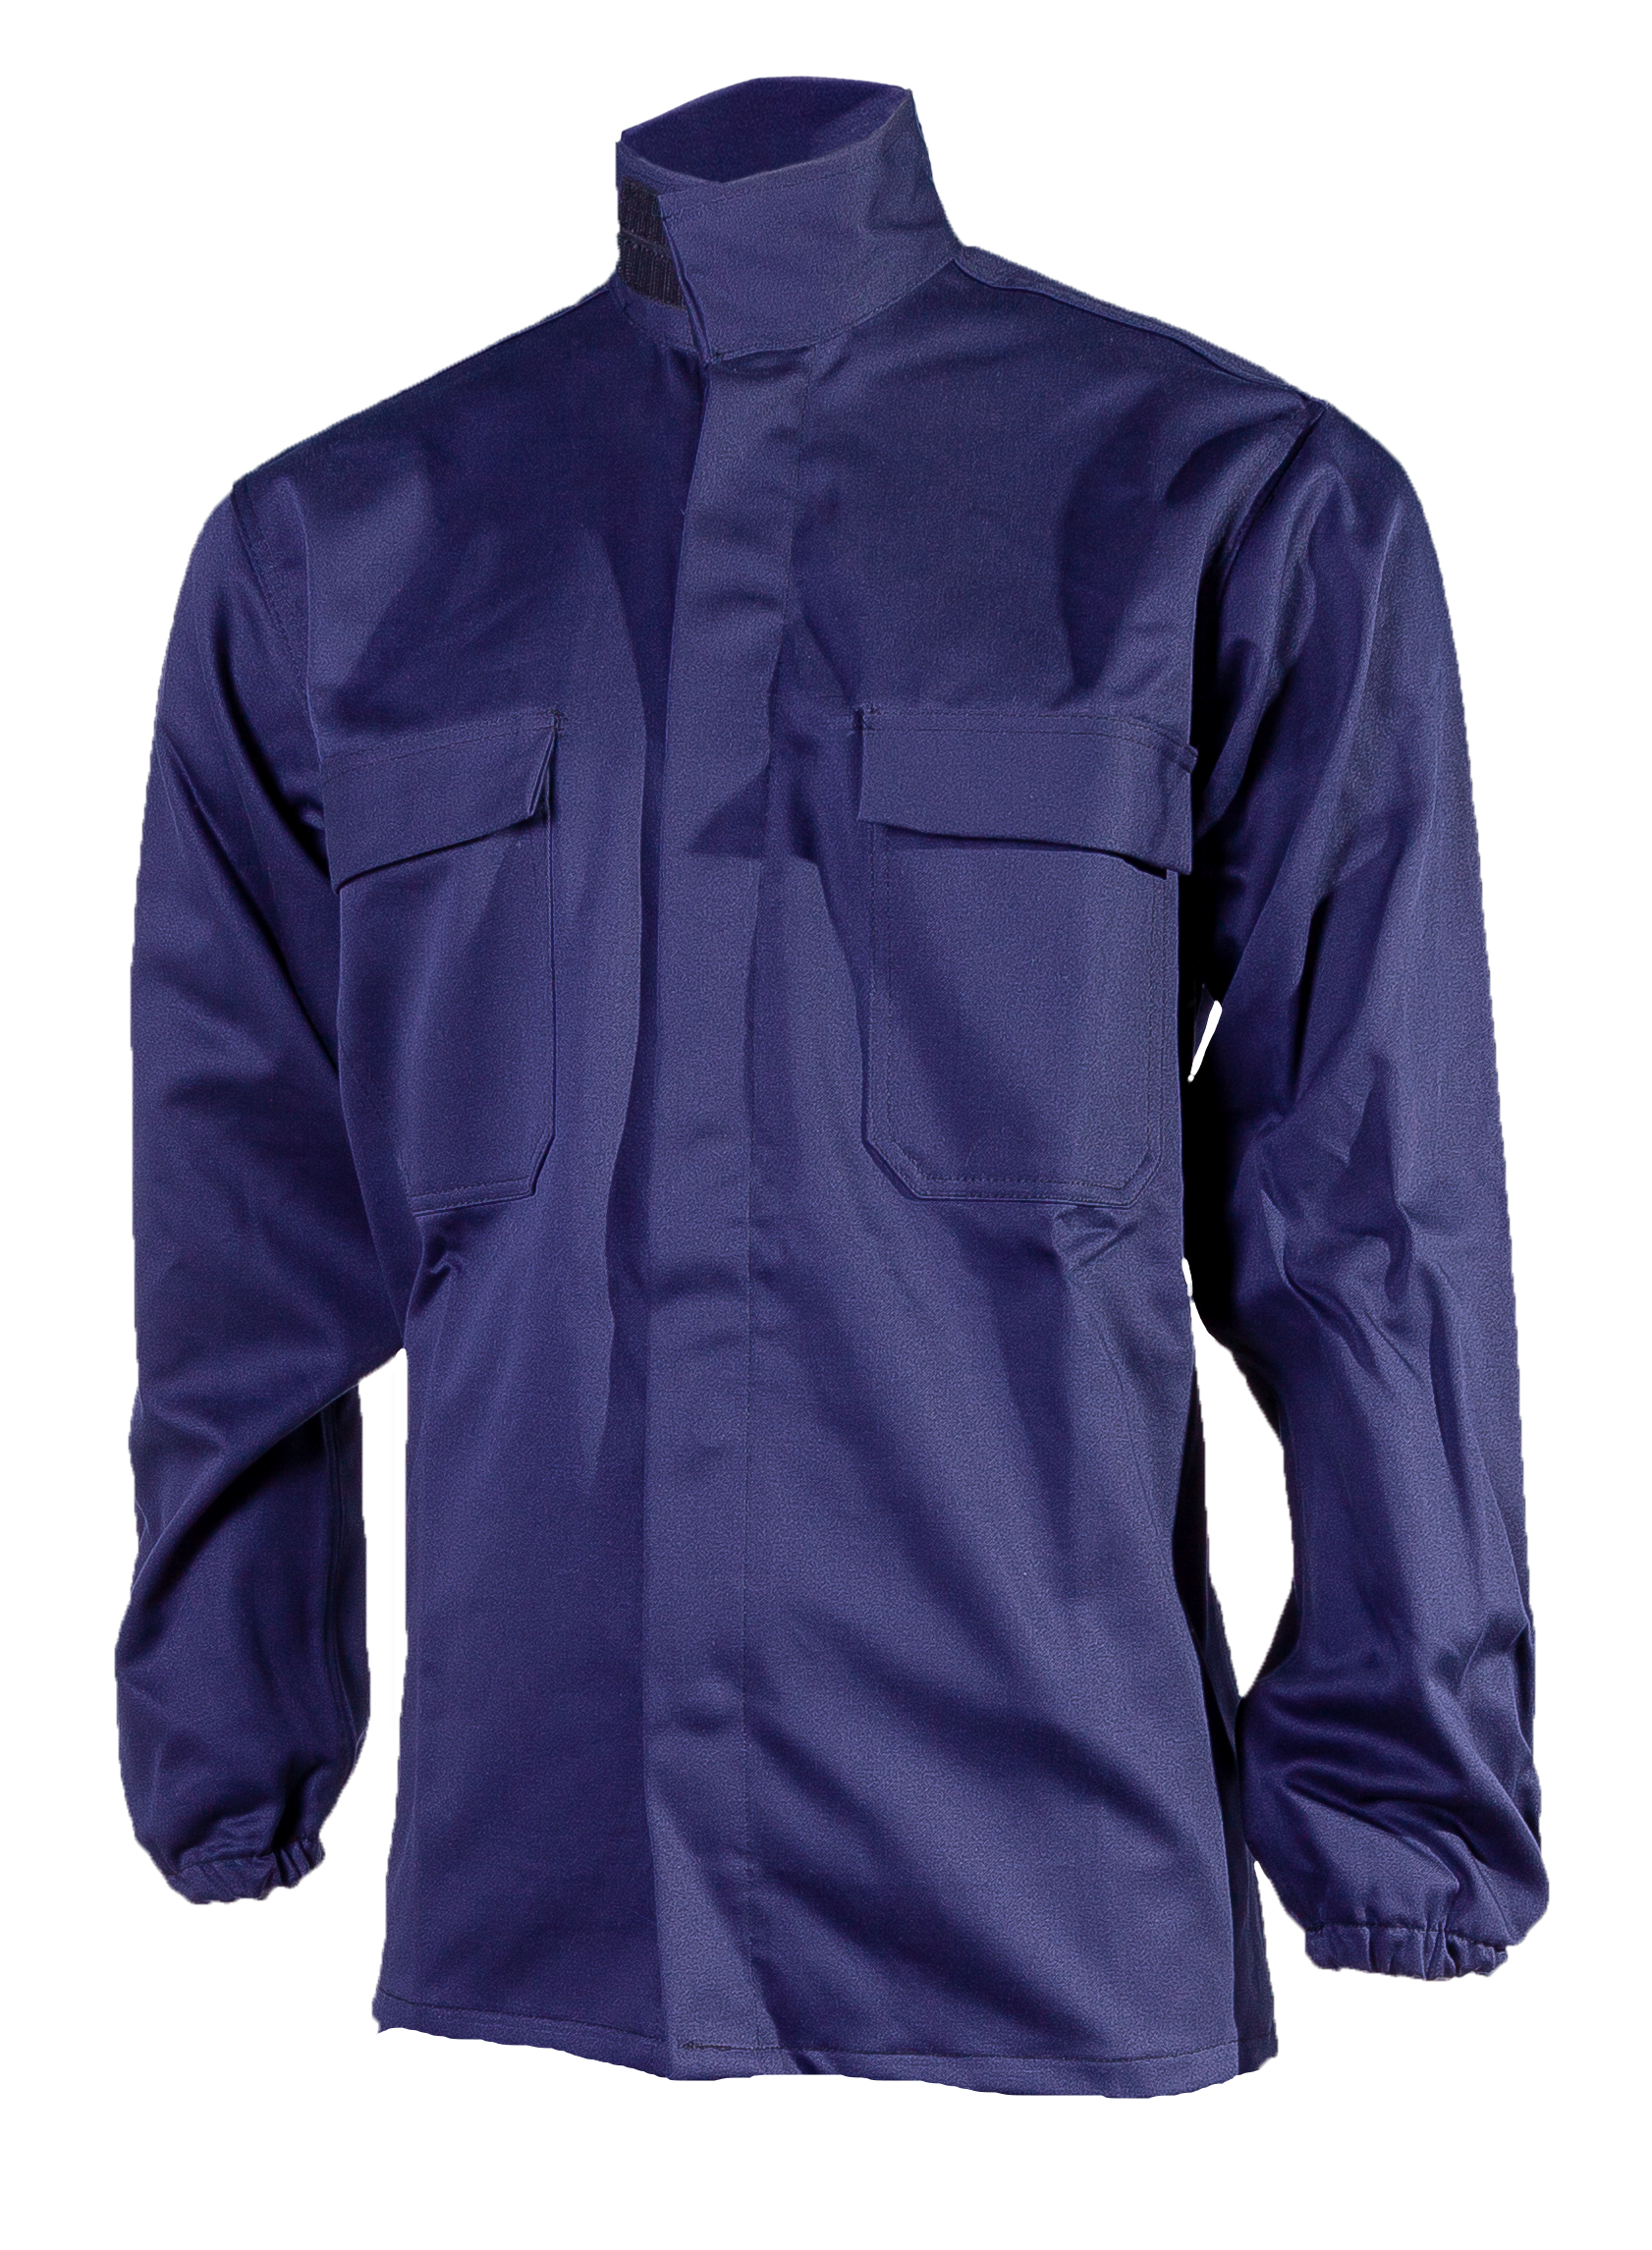 Probes - FR Cotton shirt Image